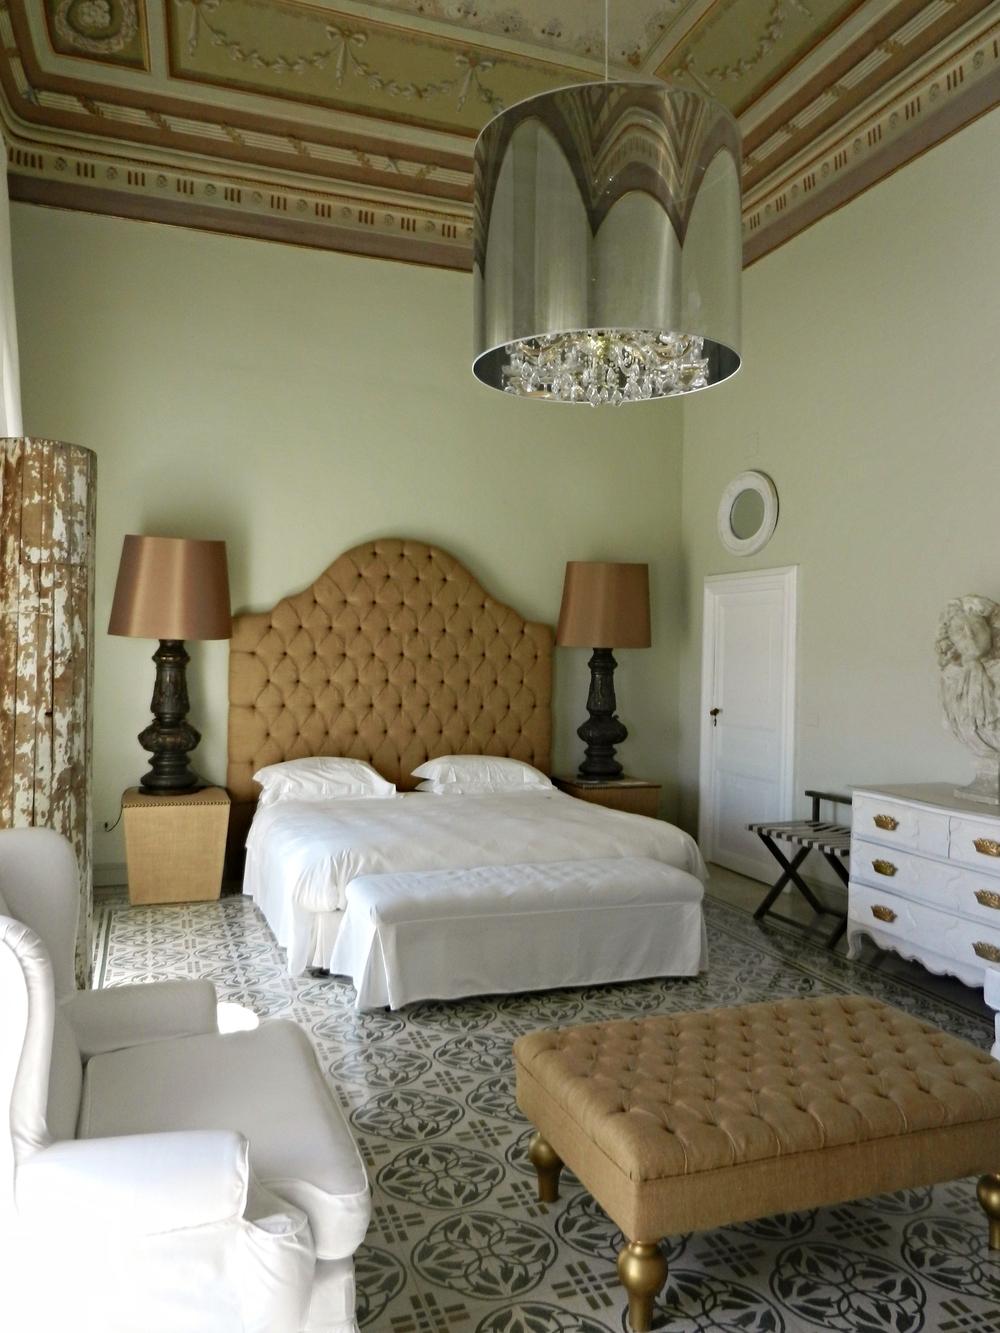 The former bedroom of a prince, at the Villadorata 7 Rooms, Noto, Sicily